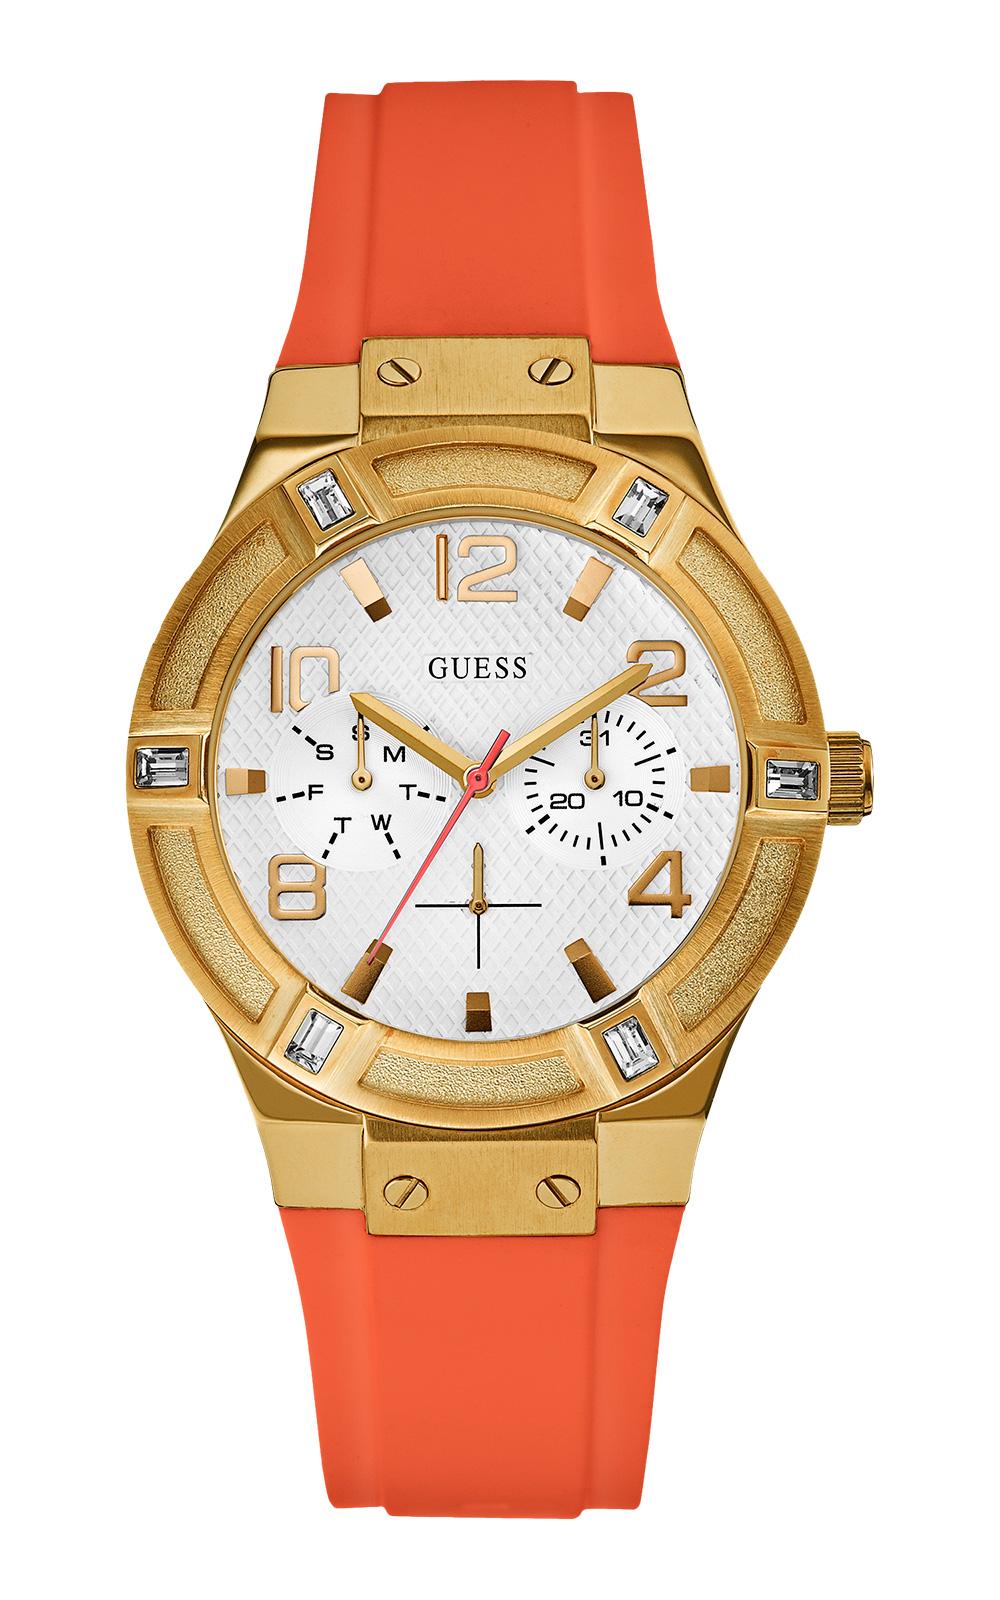 35a4e905c4f5 Женские часы GUESS W0564L2 fashion, круглые, белые с камнями и гарантией 24  месяца